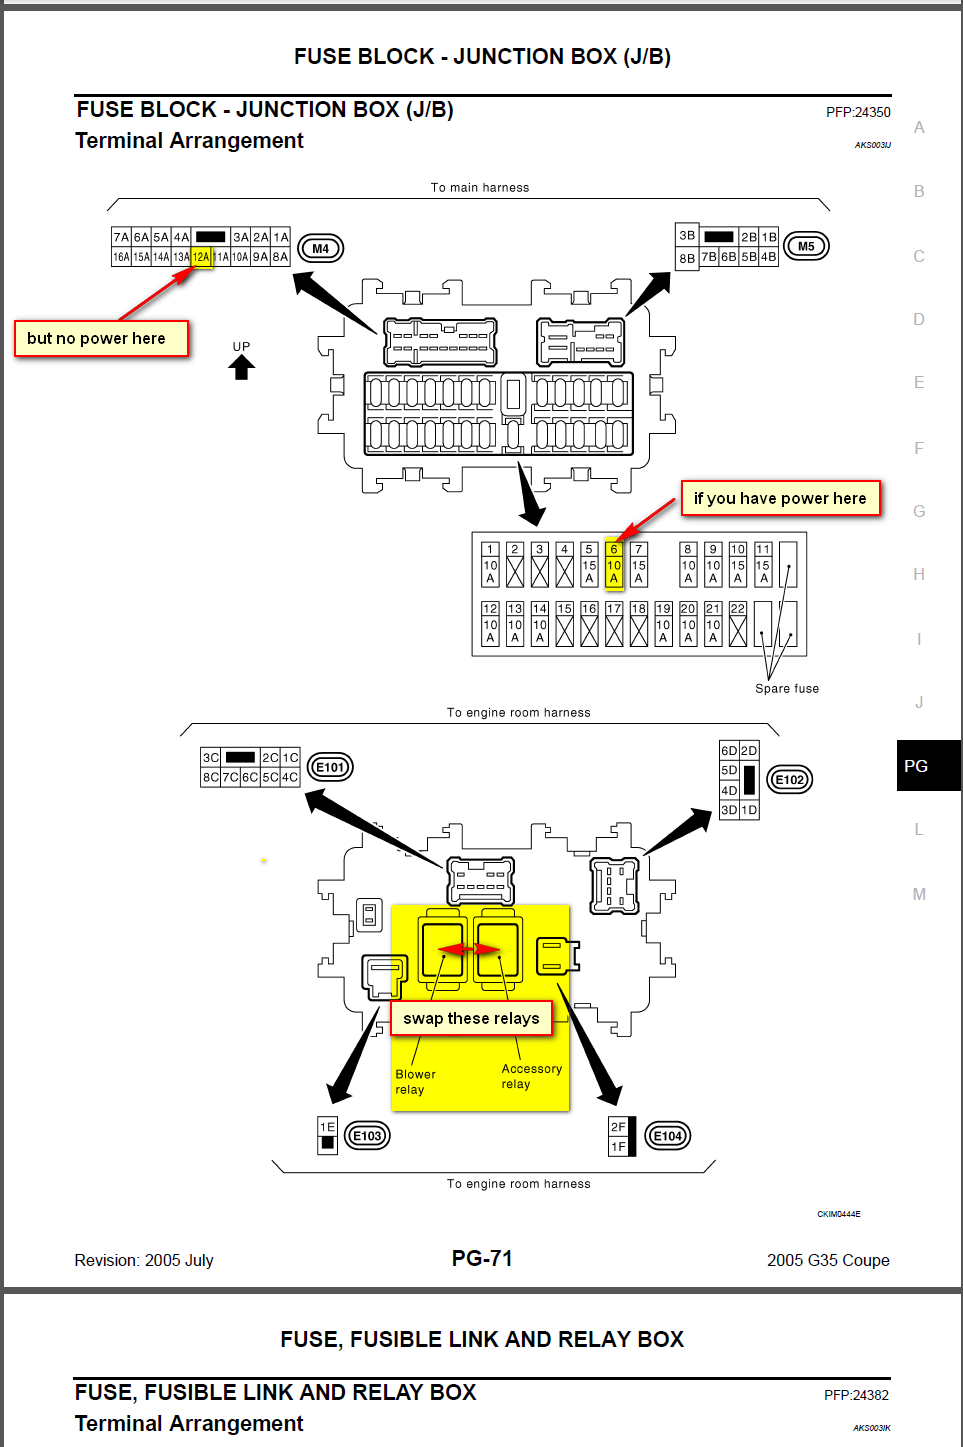 2005 G35 Fuse Box Diagram